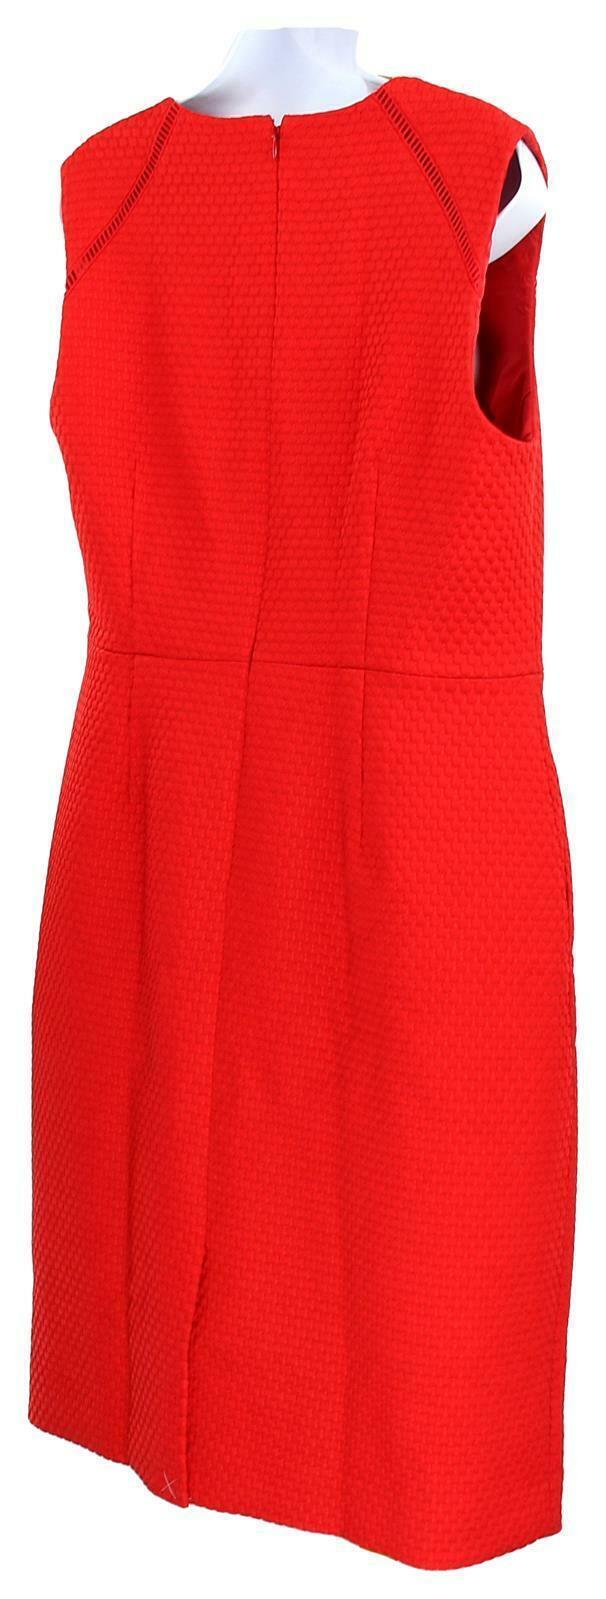 J Crew Women's Portfolio Sheath Dress /Suiting Career Work Red  12 F0791 image 6